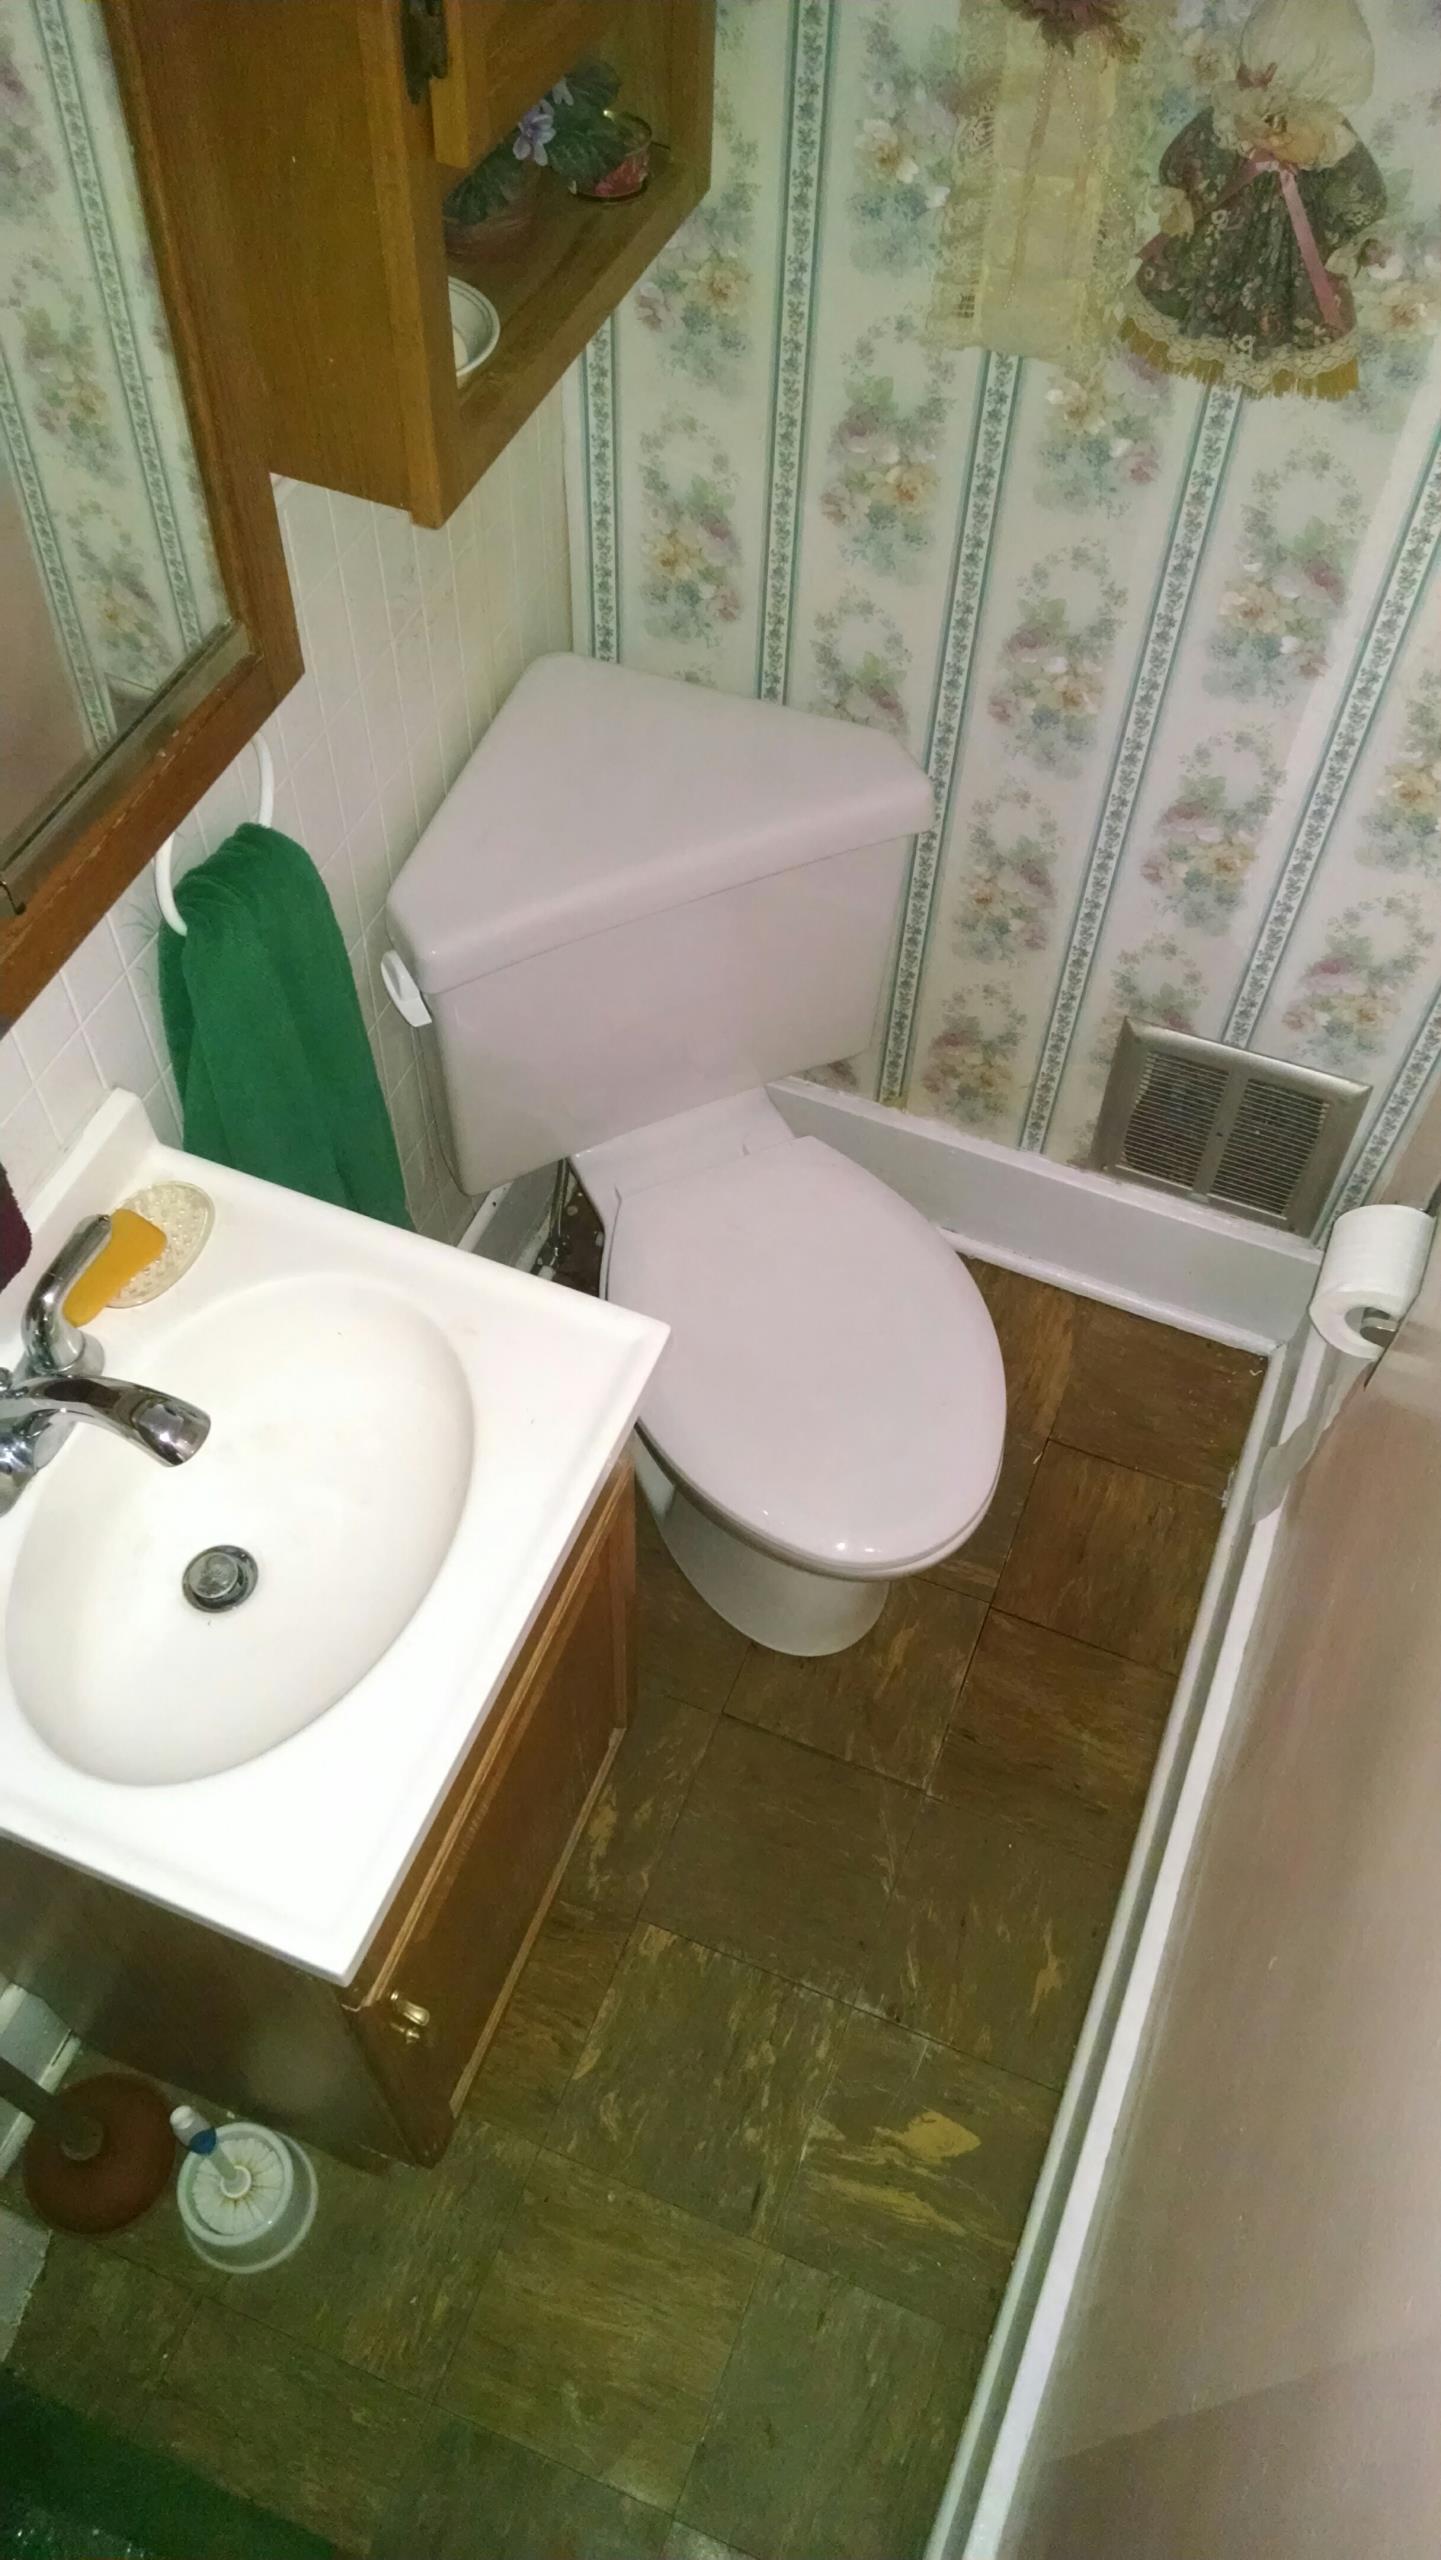 Saint Clair, MI - Leaking toilet